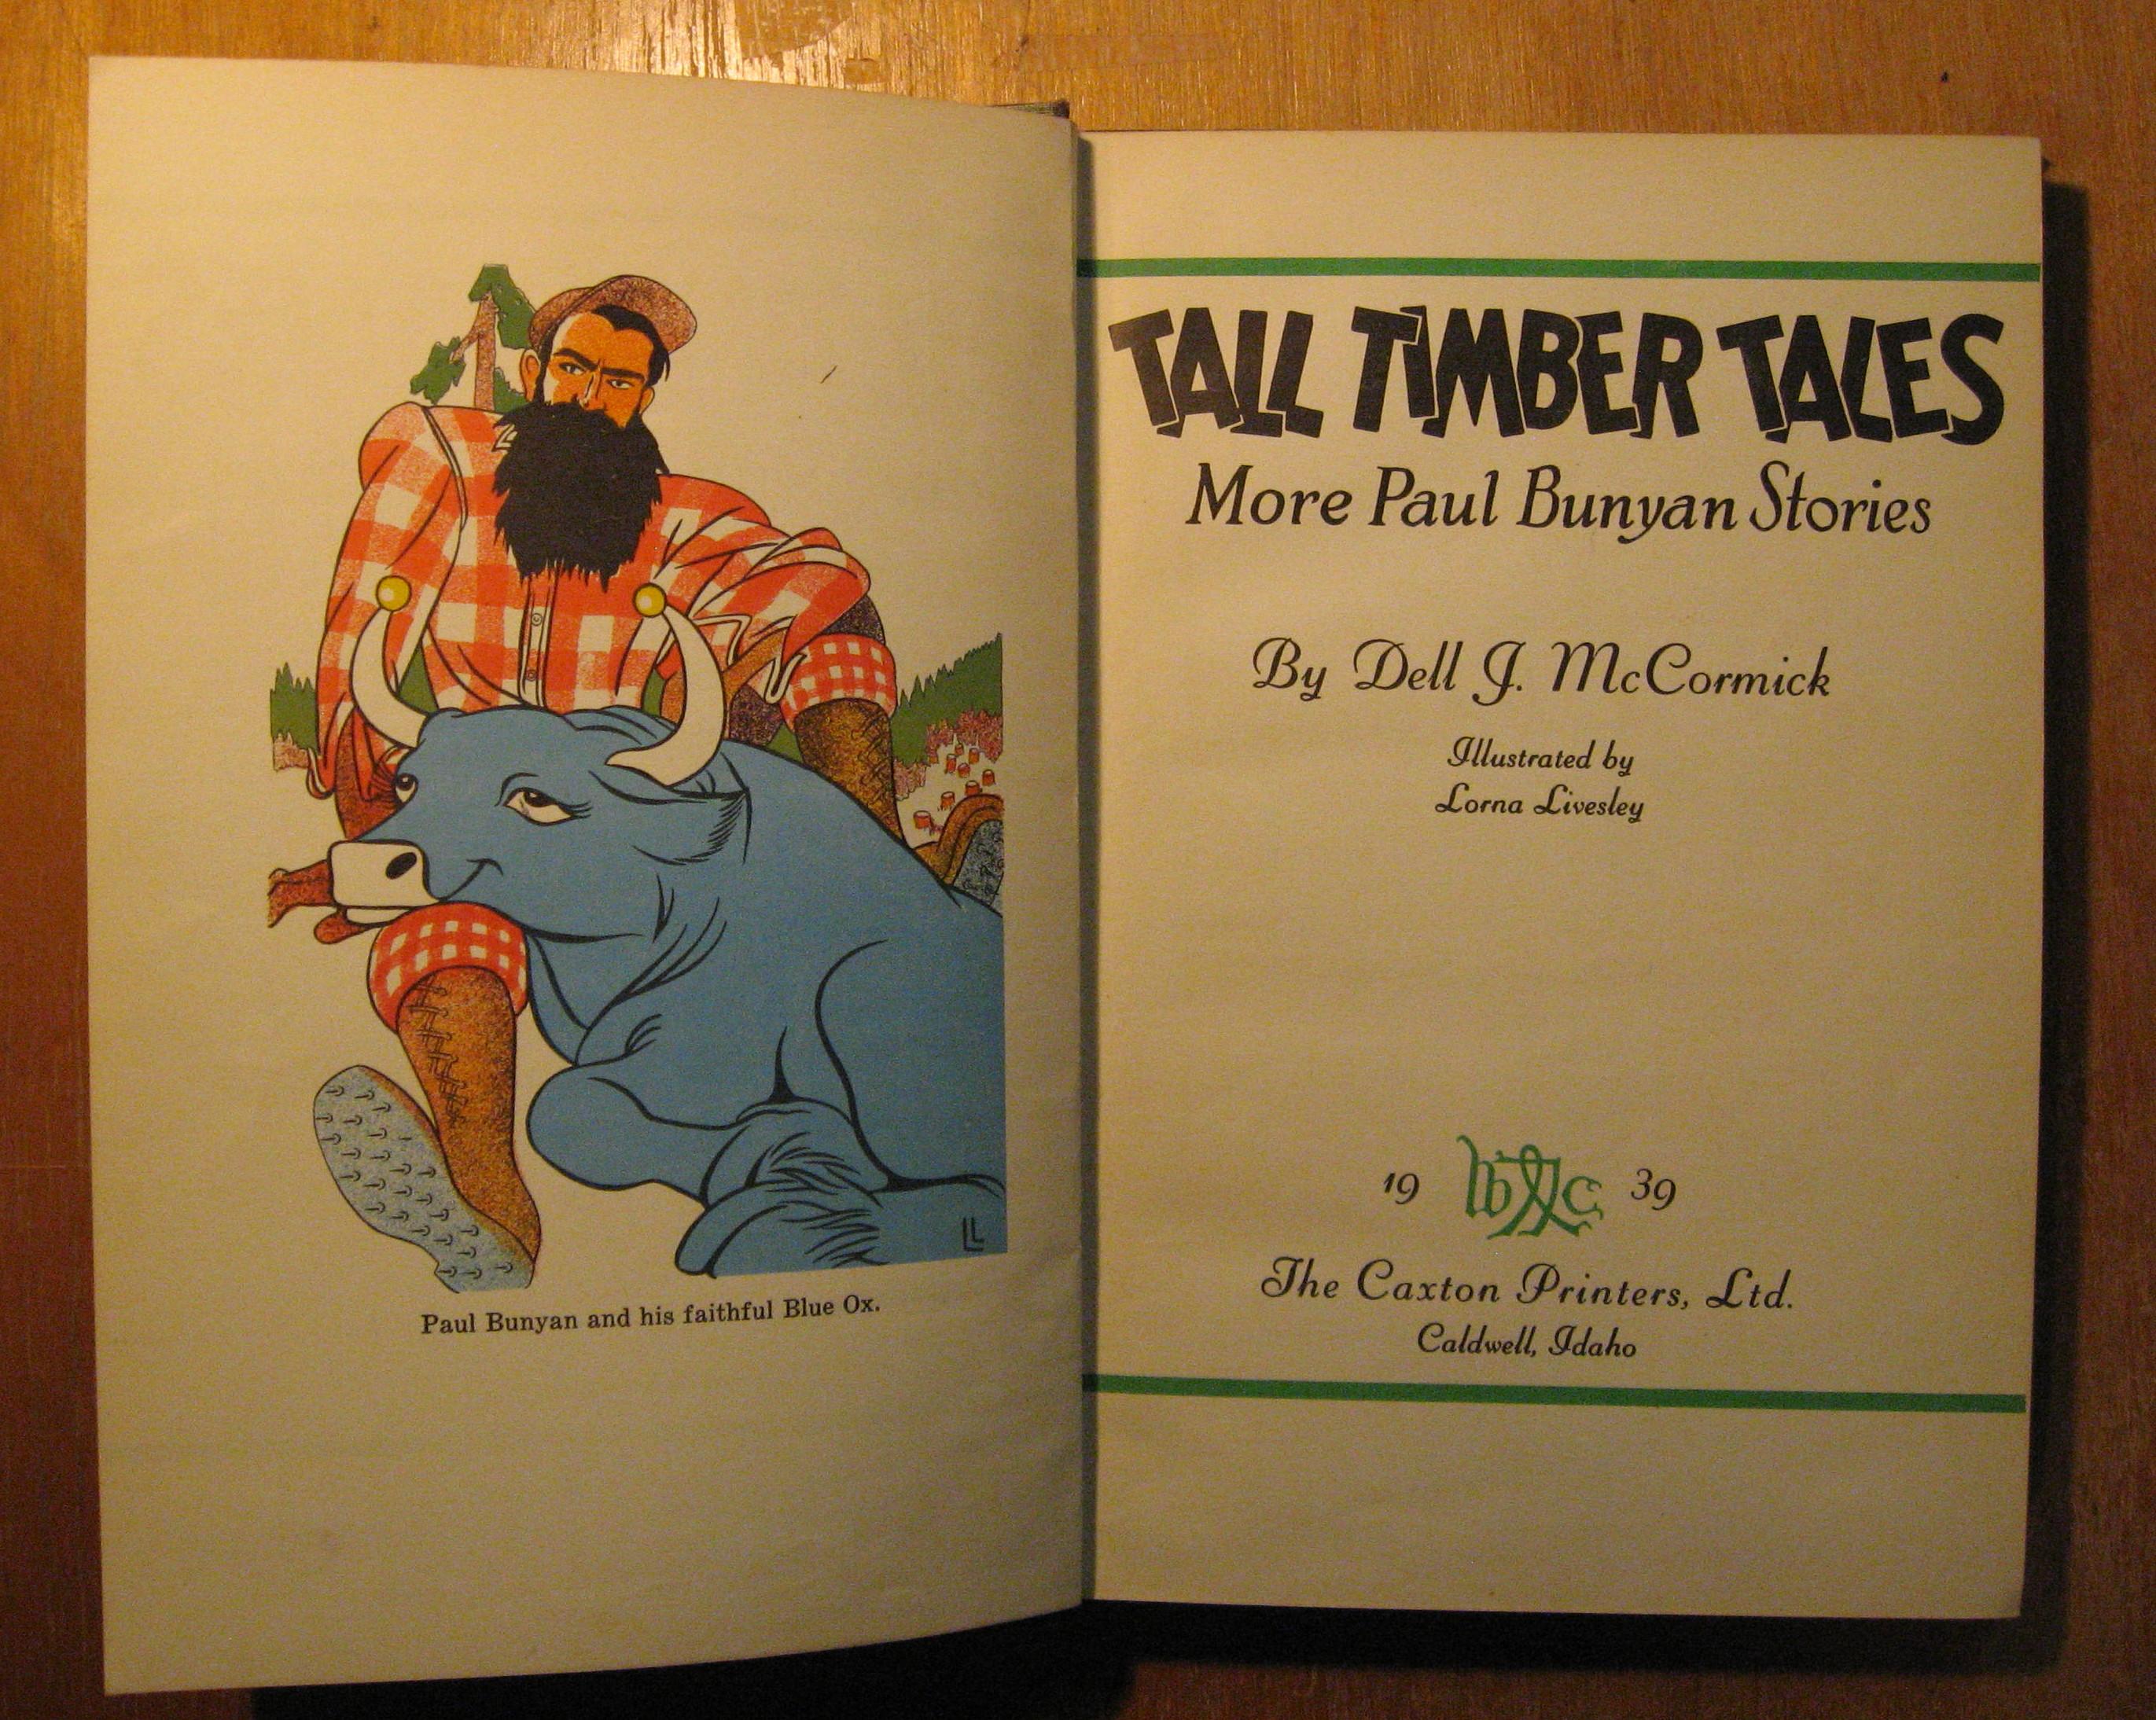 Tall Timber Tales:  More Paul Bunyan Stories, McCormick, Dell J.